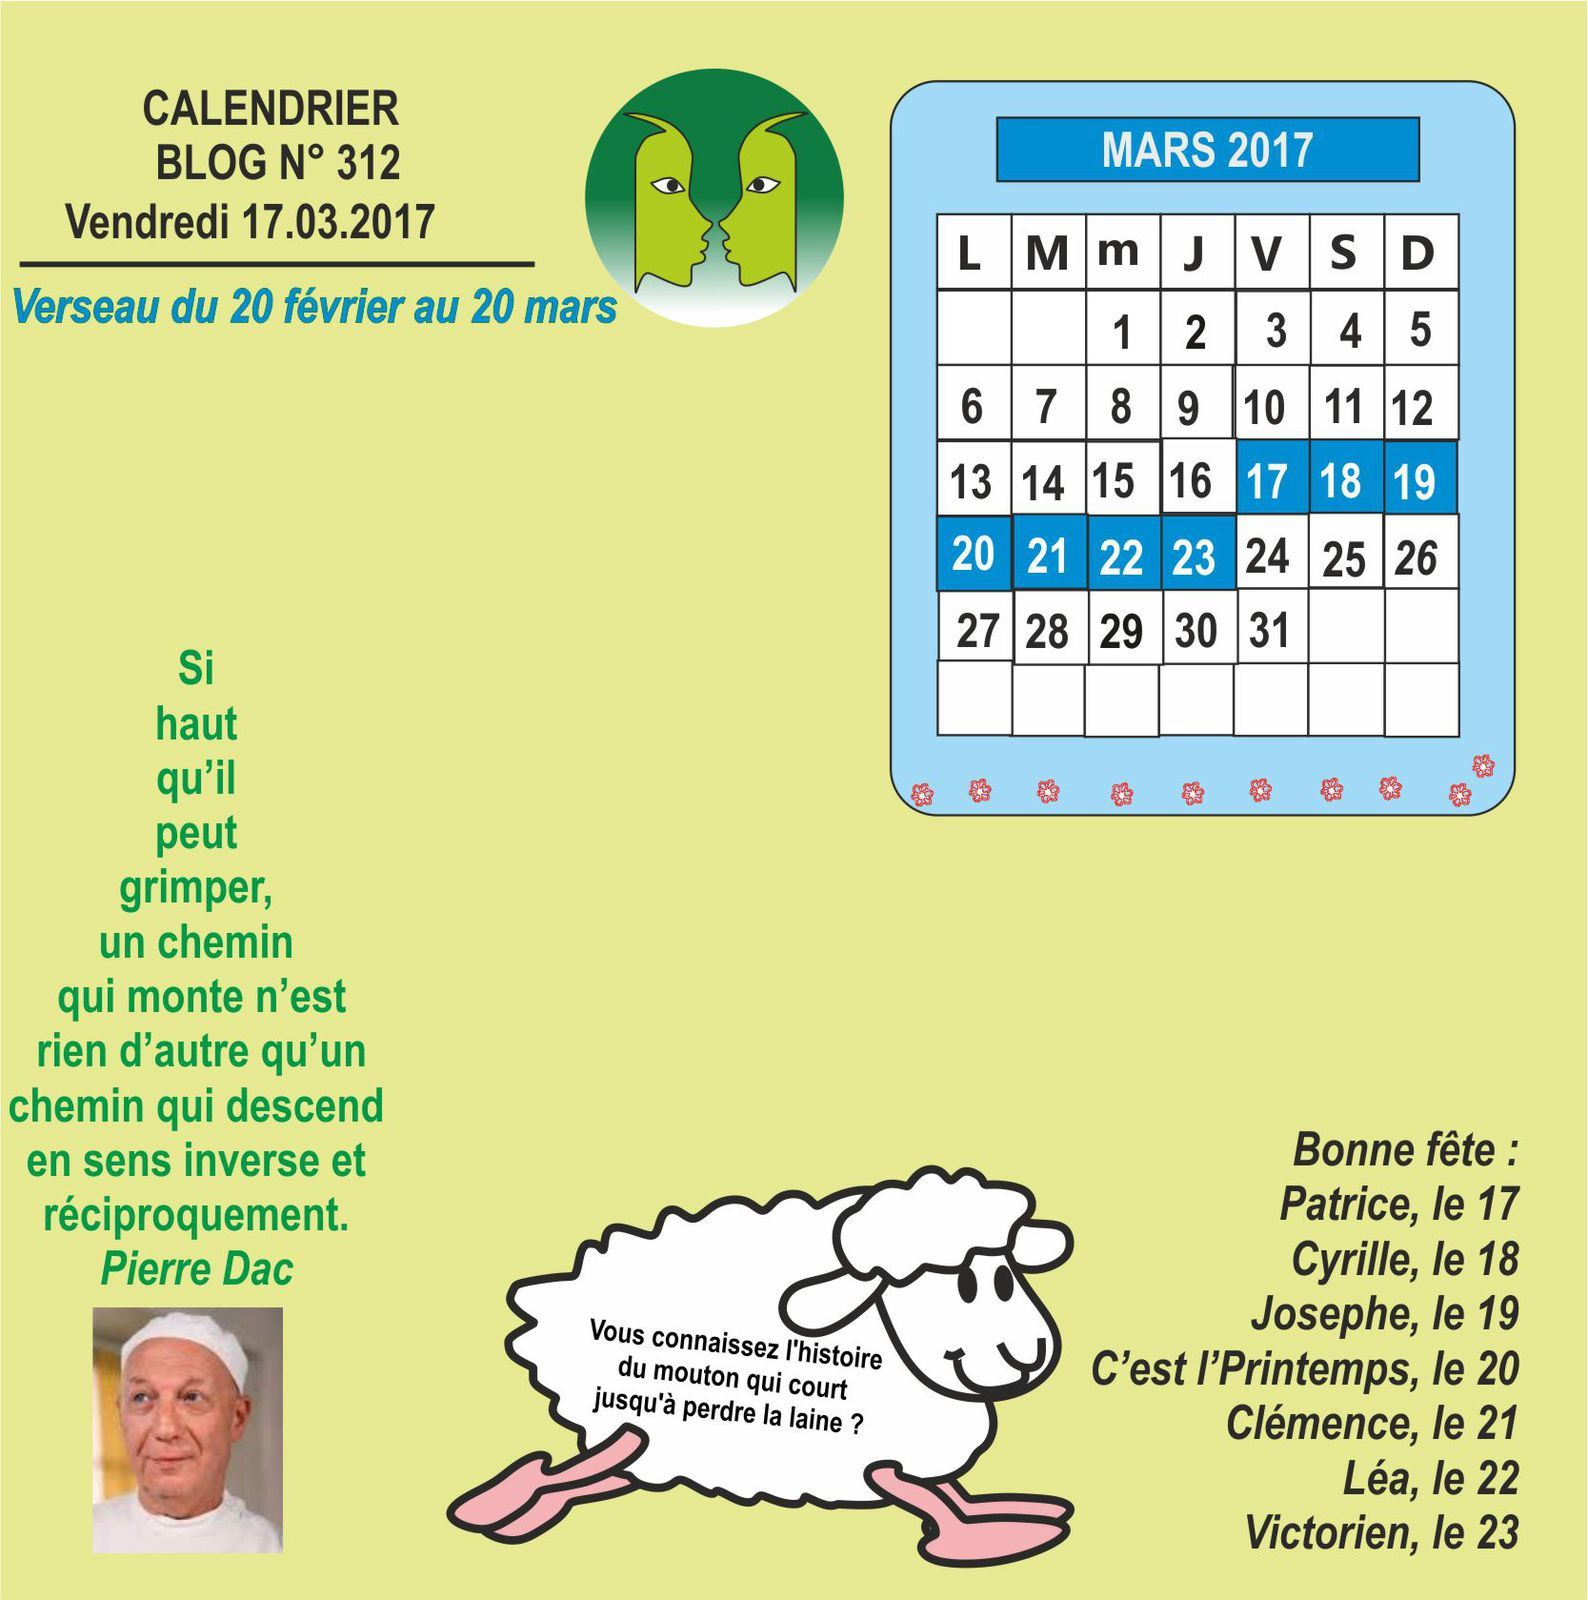 16 MARS 2017 - INFOS DU CIQ